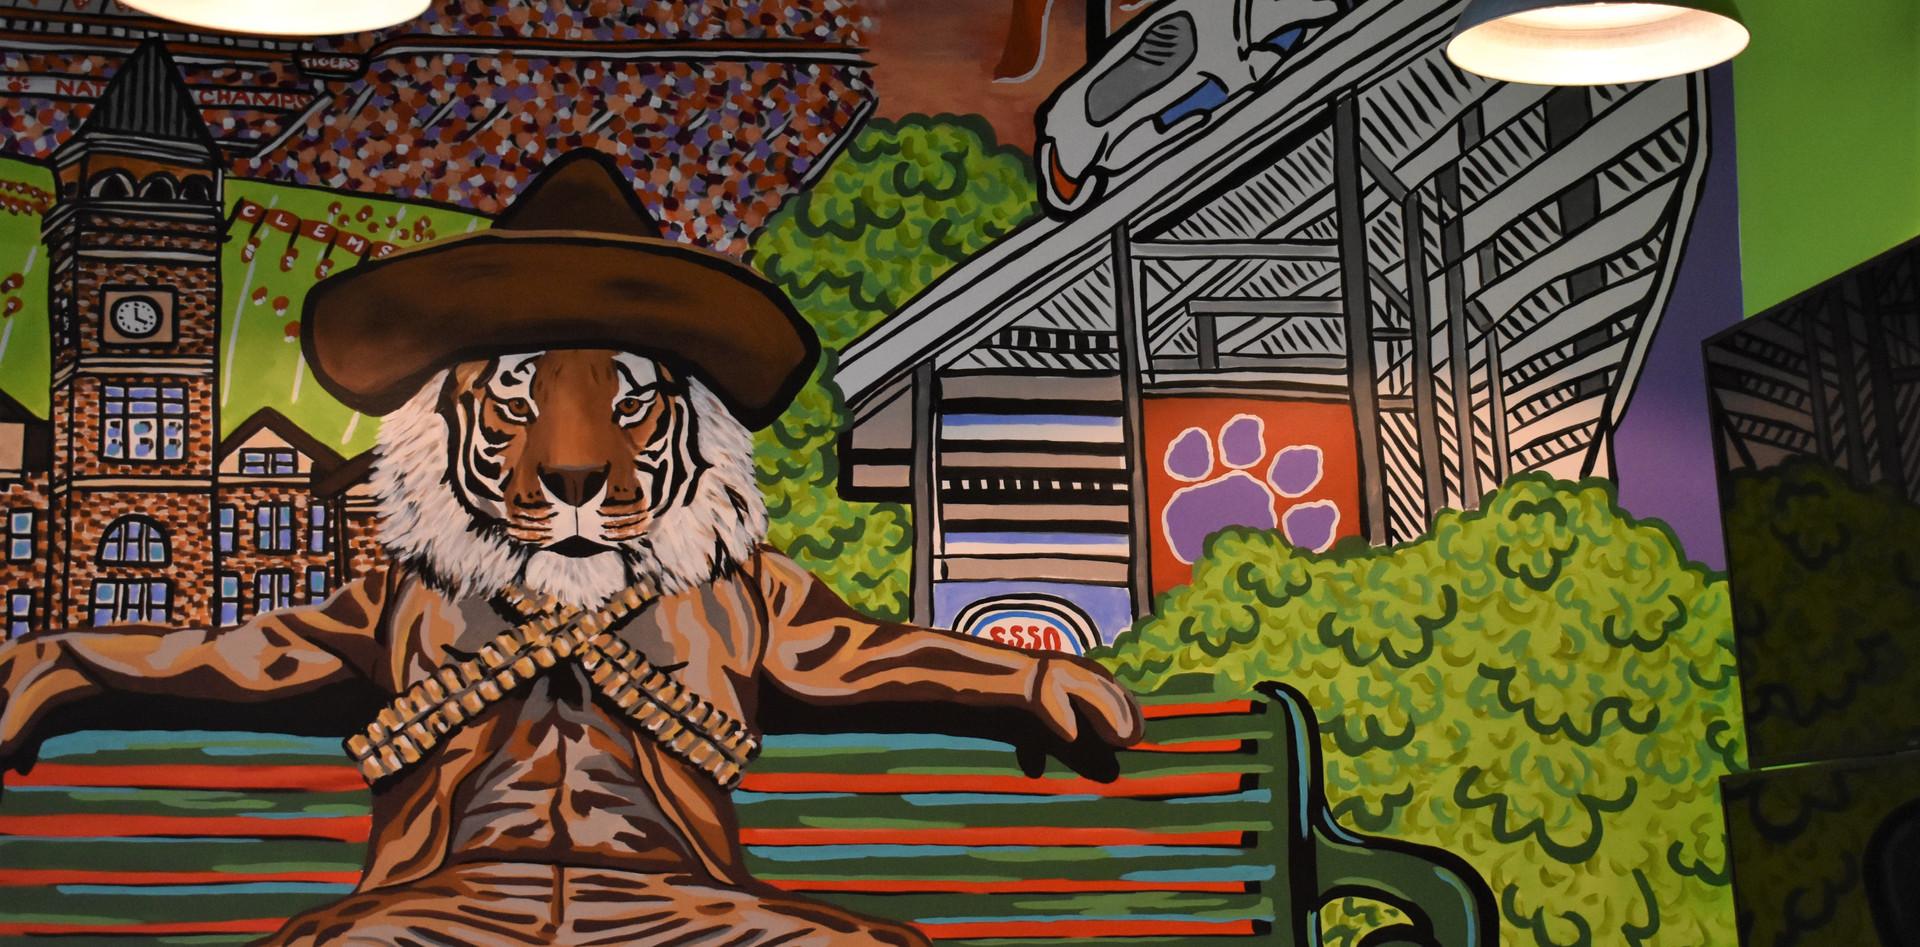 Tipsy Taco Clemson Tiger Mural